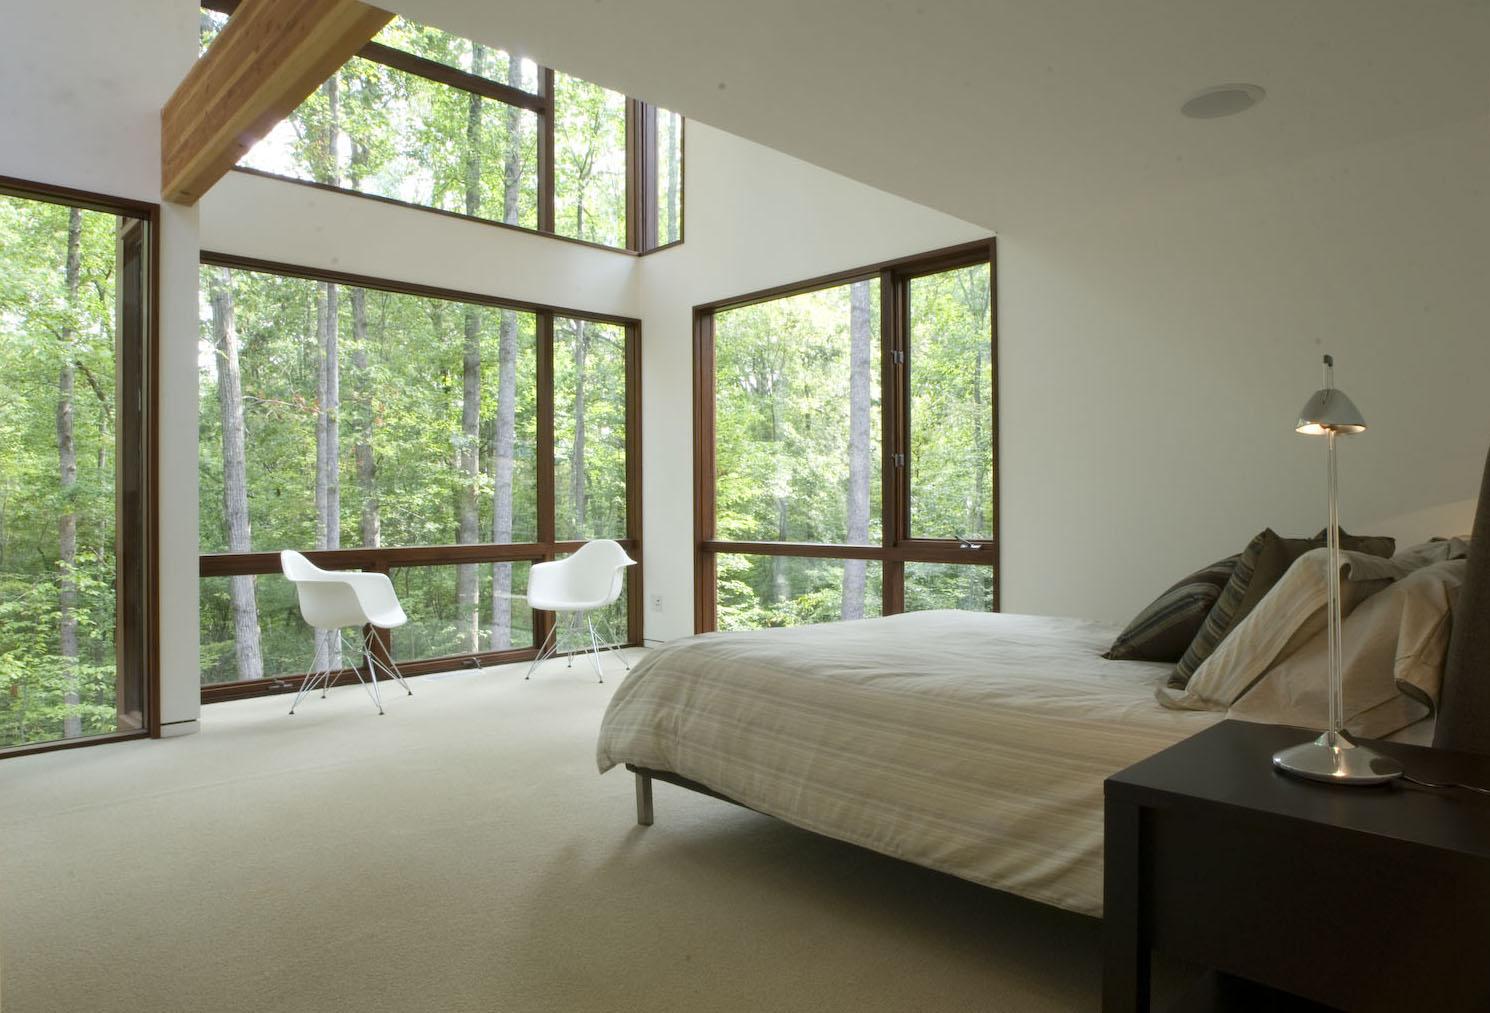 turkel_modern_design_prefab_home_redhill_hillsborough_bedroom.jpg